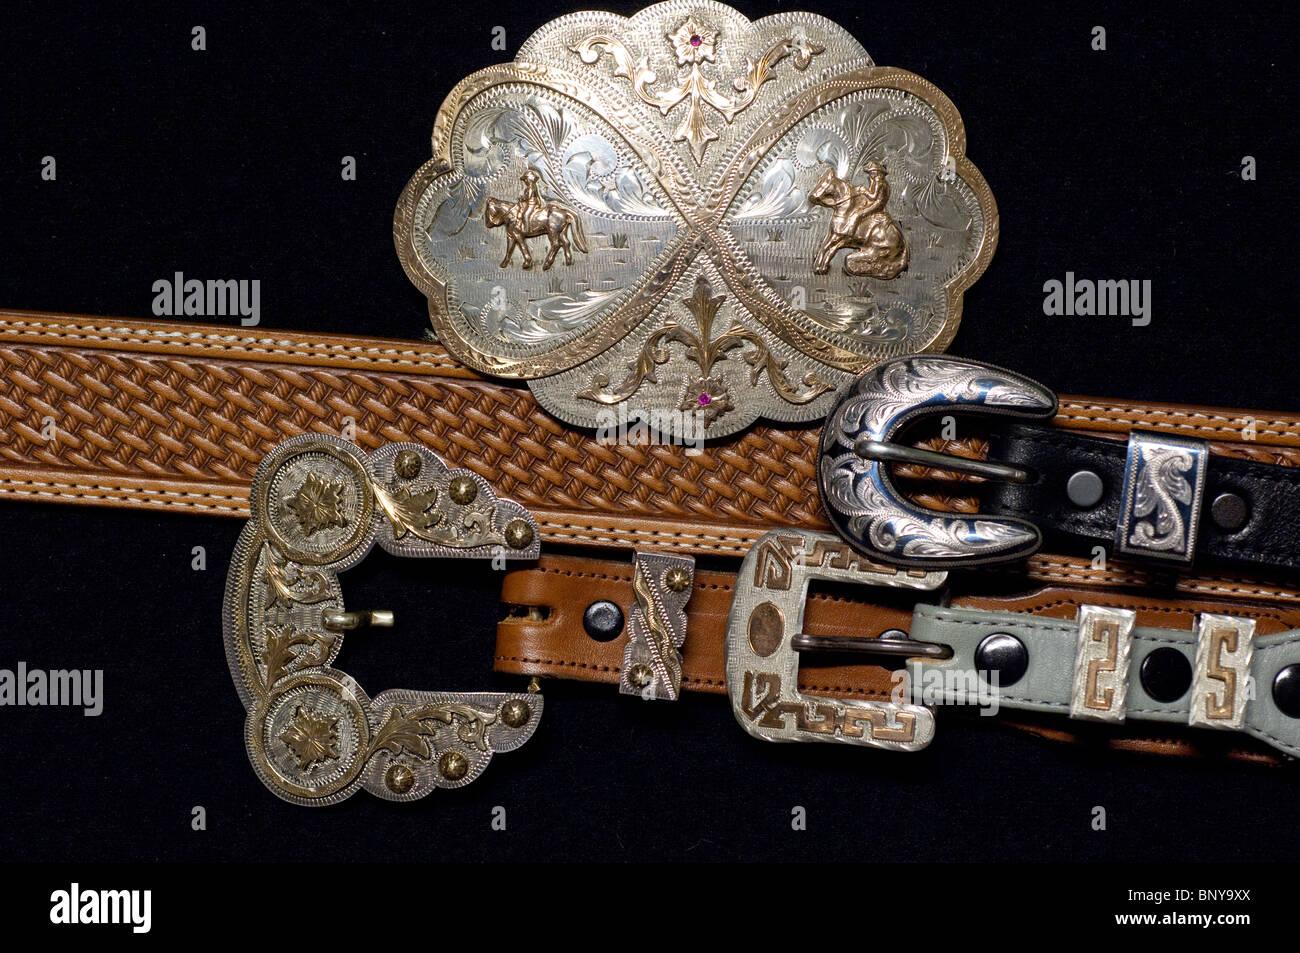 Sterling silver & gold hand-engraved Western belt buckles on leather belts. Property release. - Stock Image